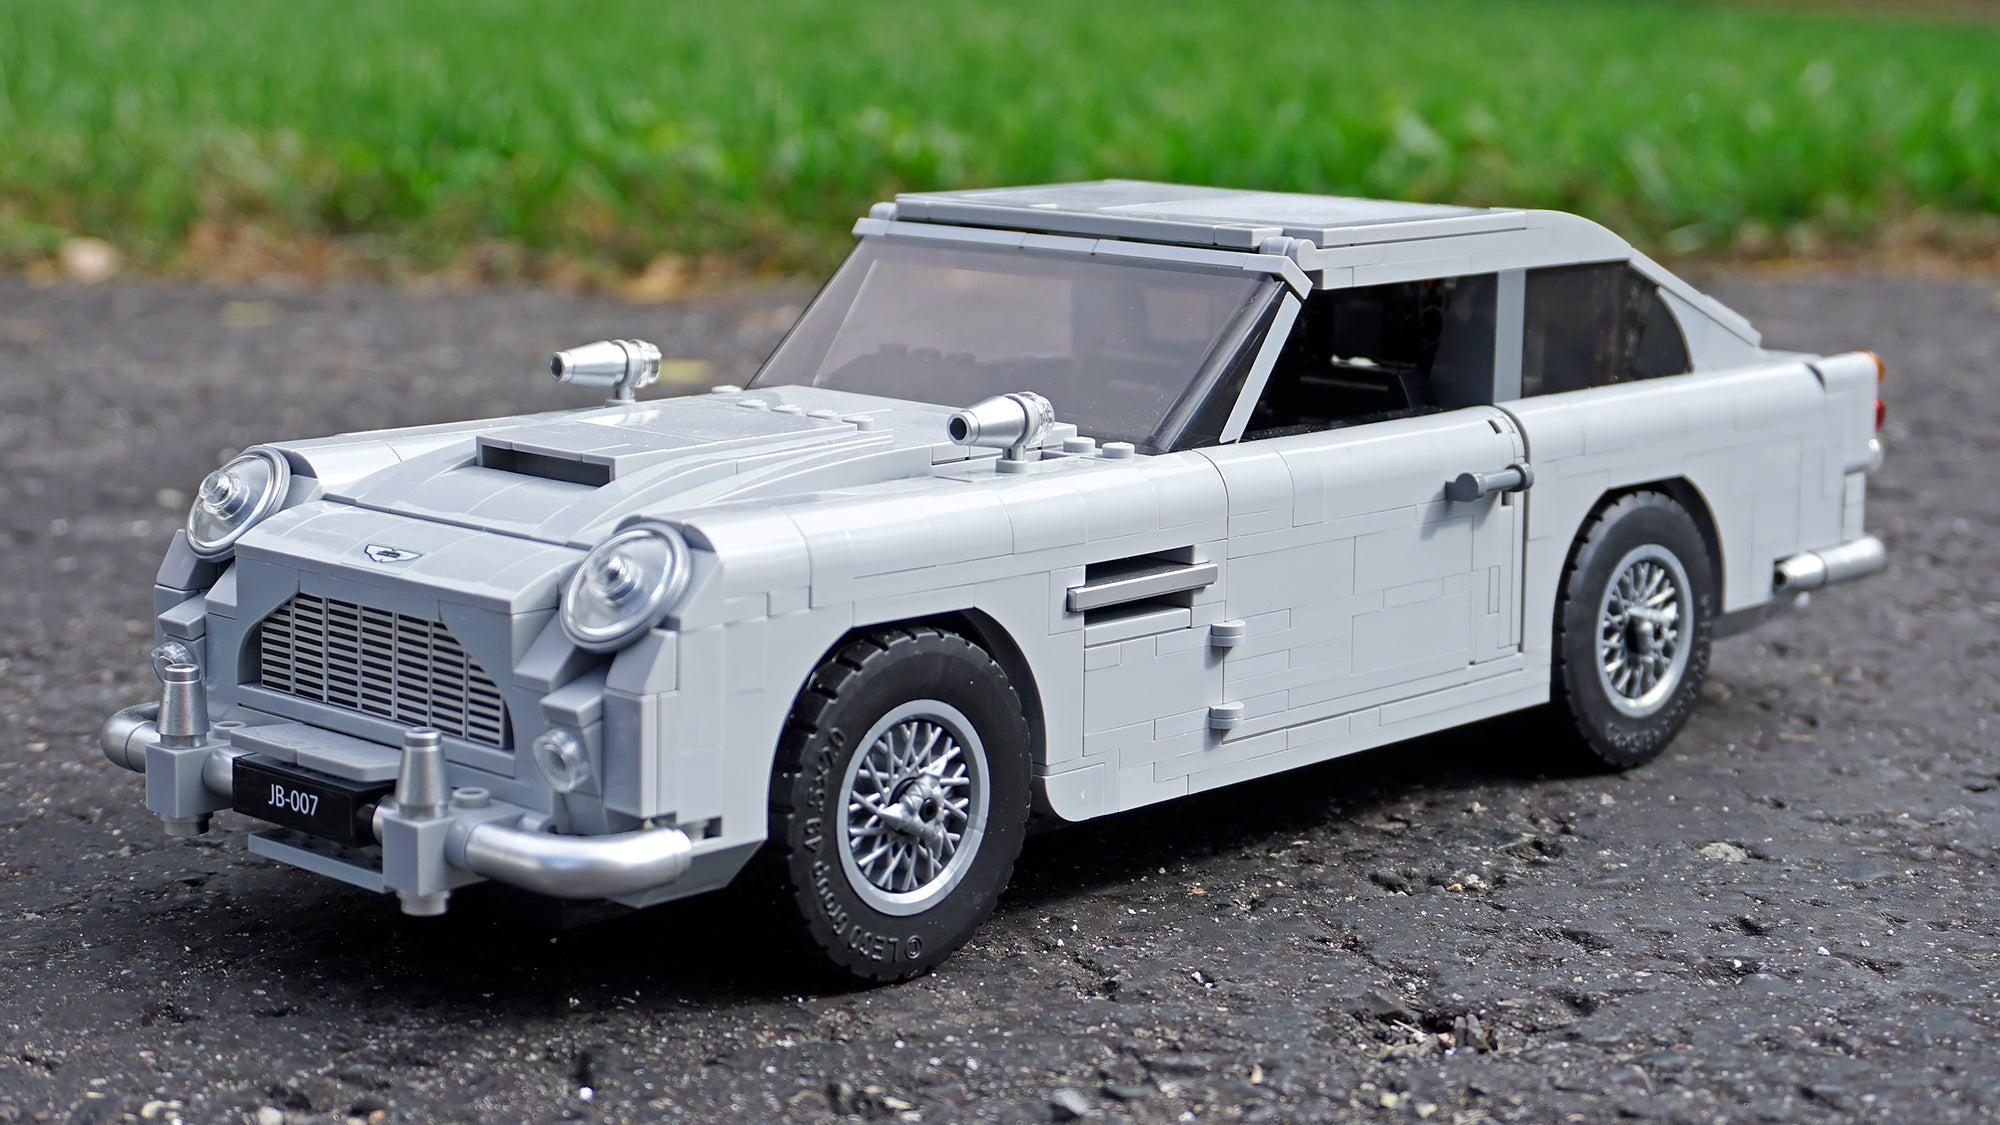 The Tiny Technical Details Make LEGO's James Bond Aston Martin A Joy To Build